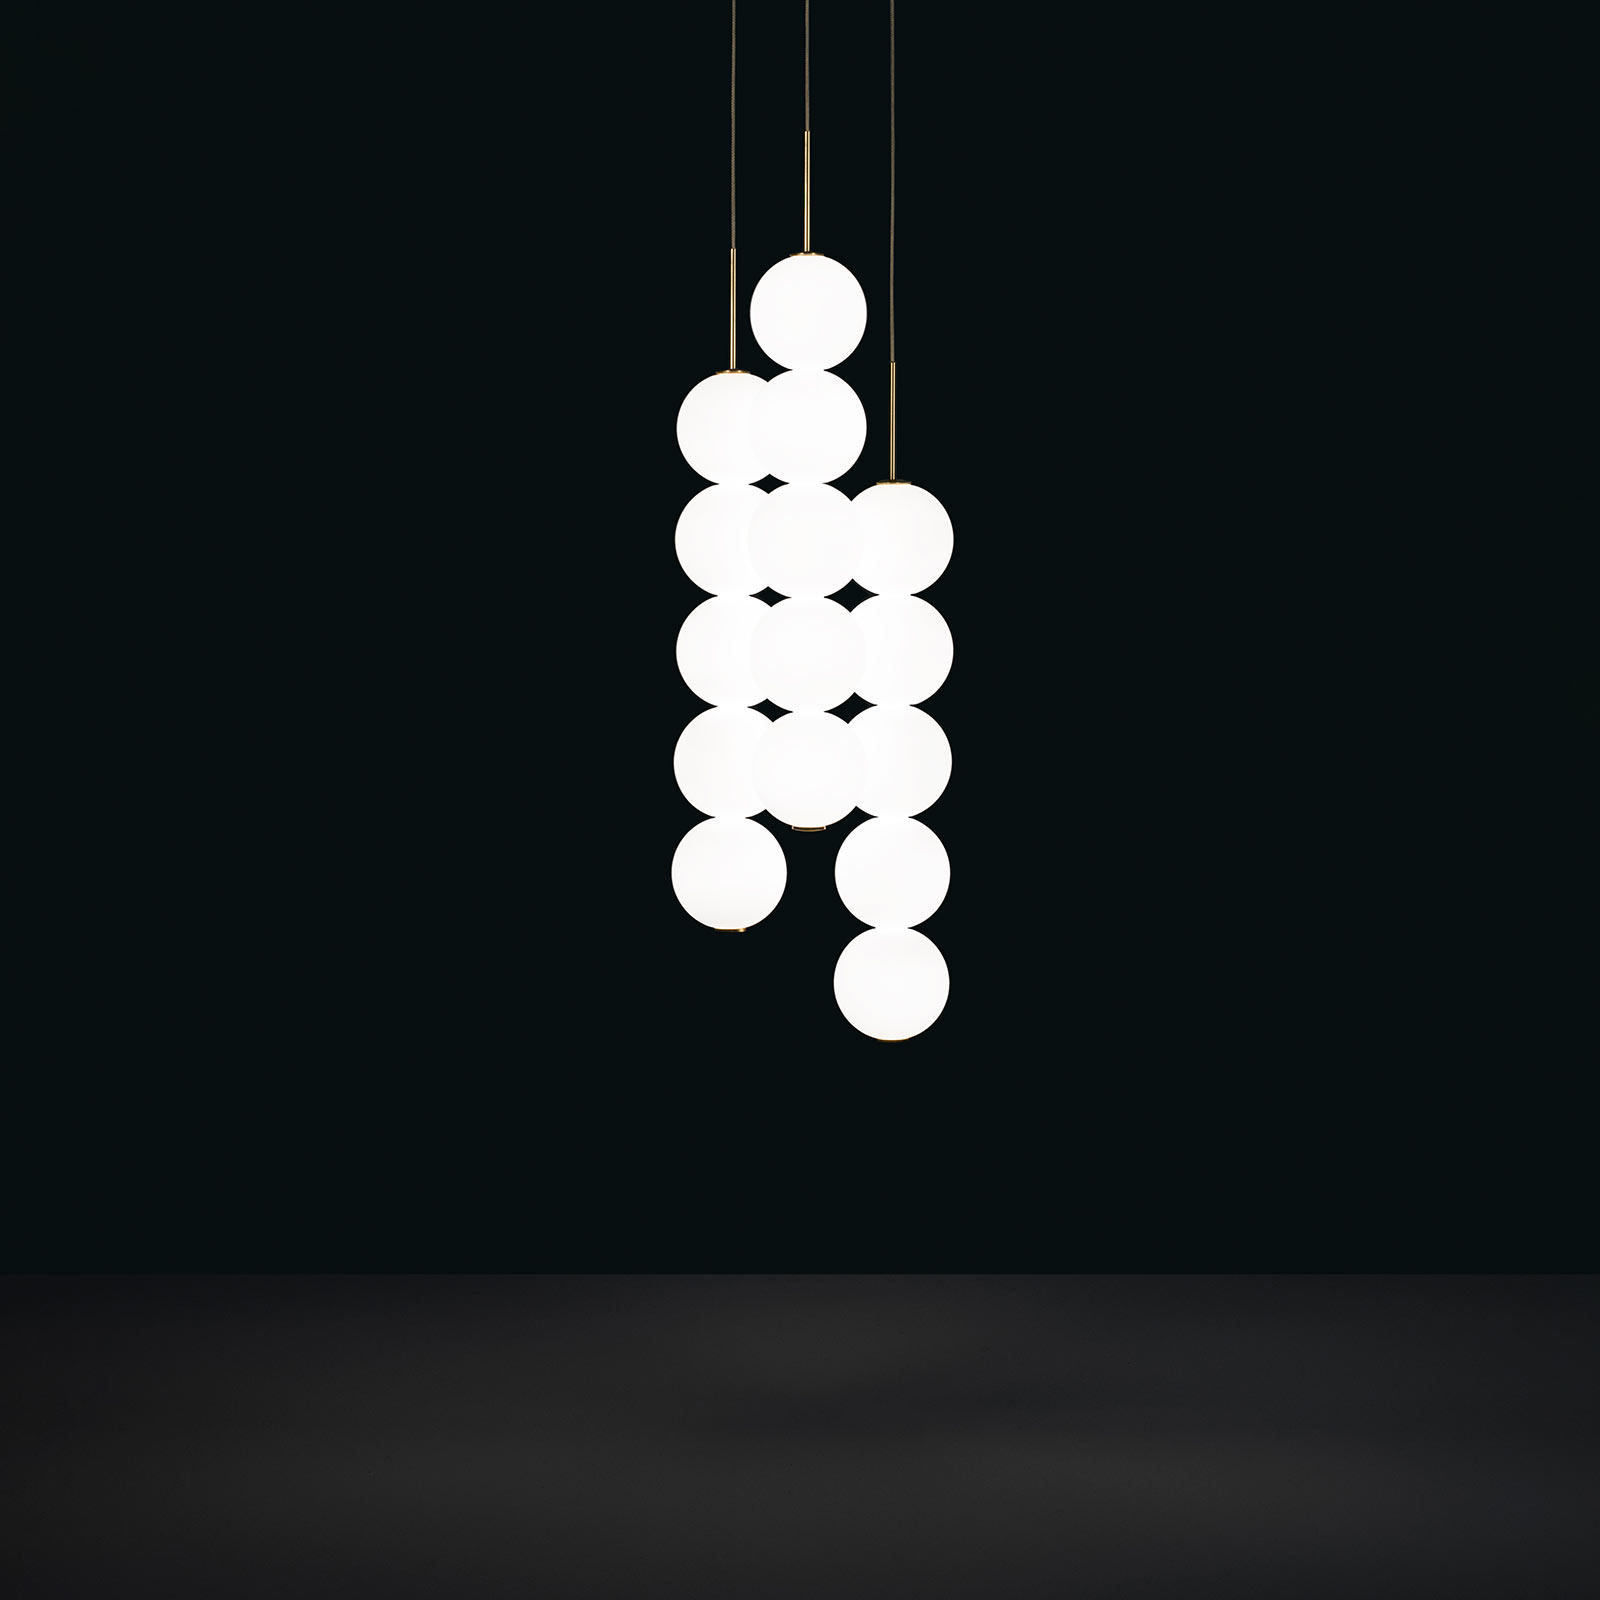 Terzani Abacus hanglamp, messing, 3x5 ballen